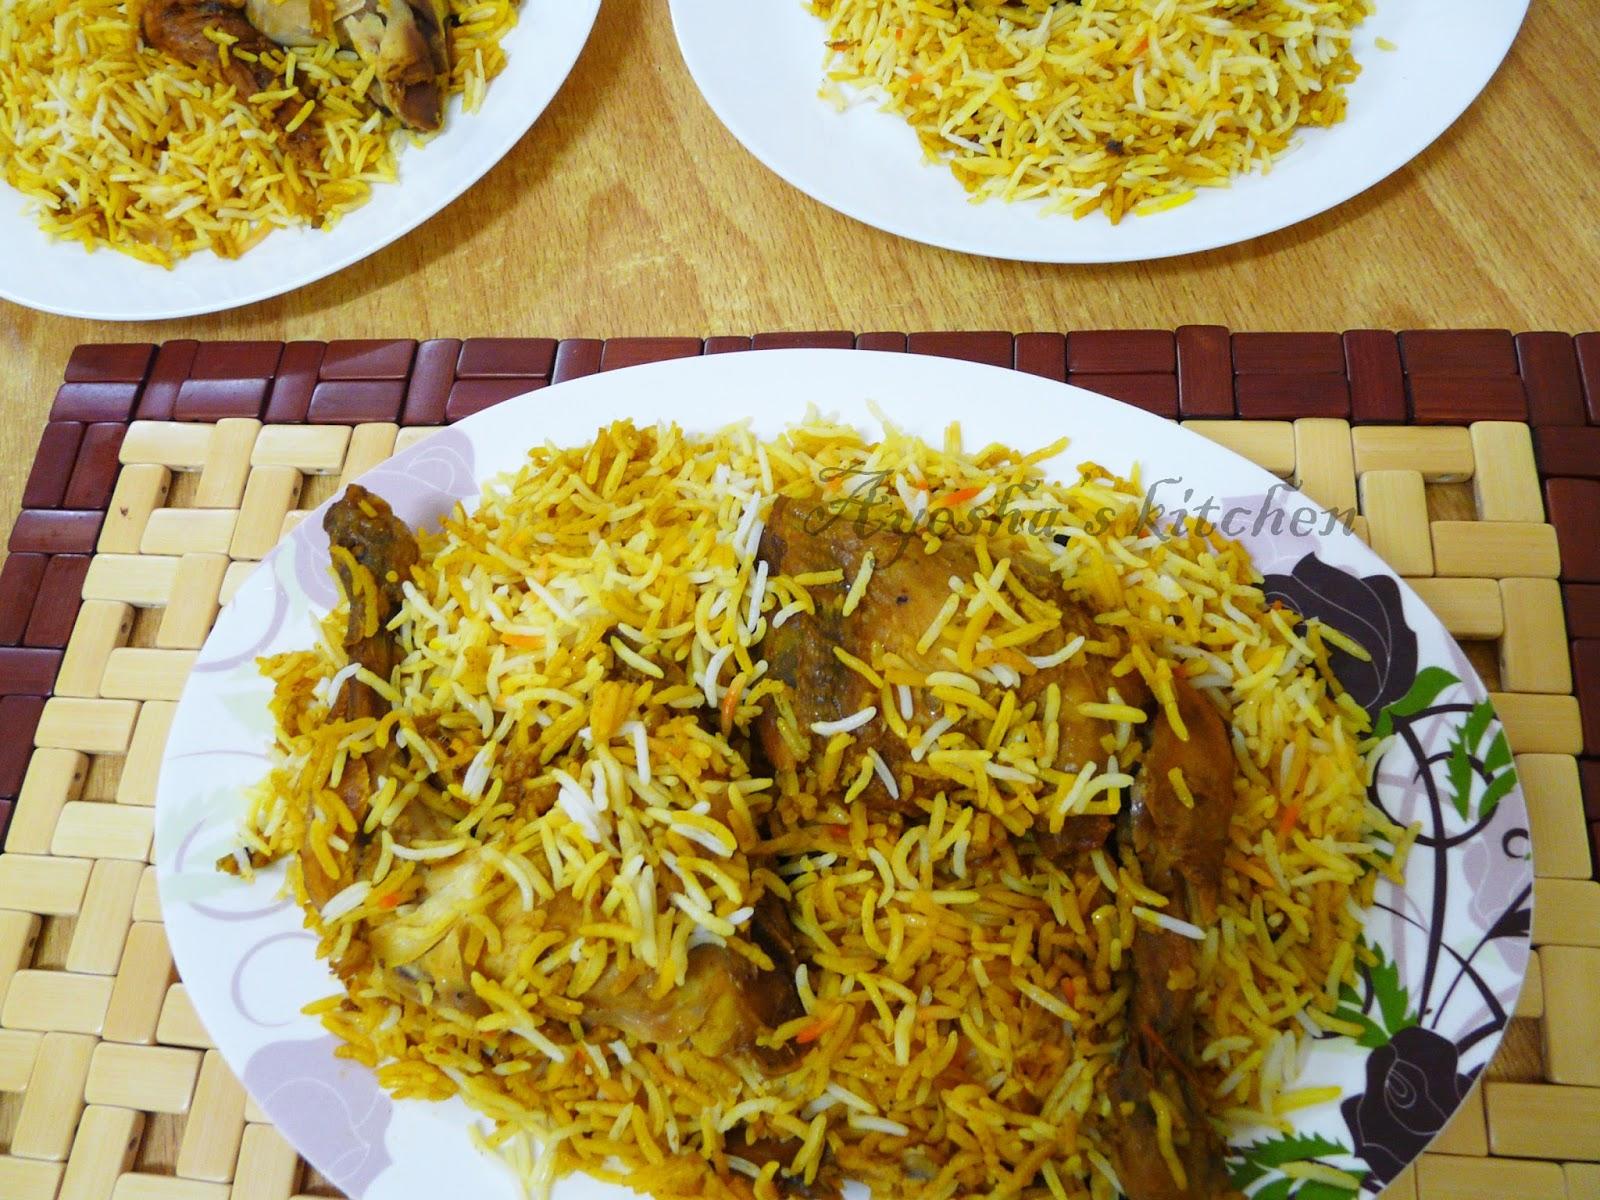 Hyderabadi chicken biryani recipe how to make hyderabadi chicken hyderabadi chicken biryani recipe ayeshas kitchen forumfinder Images